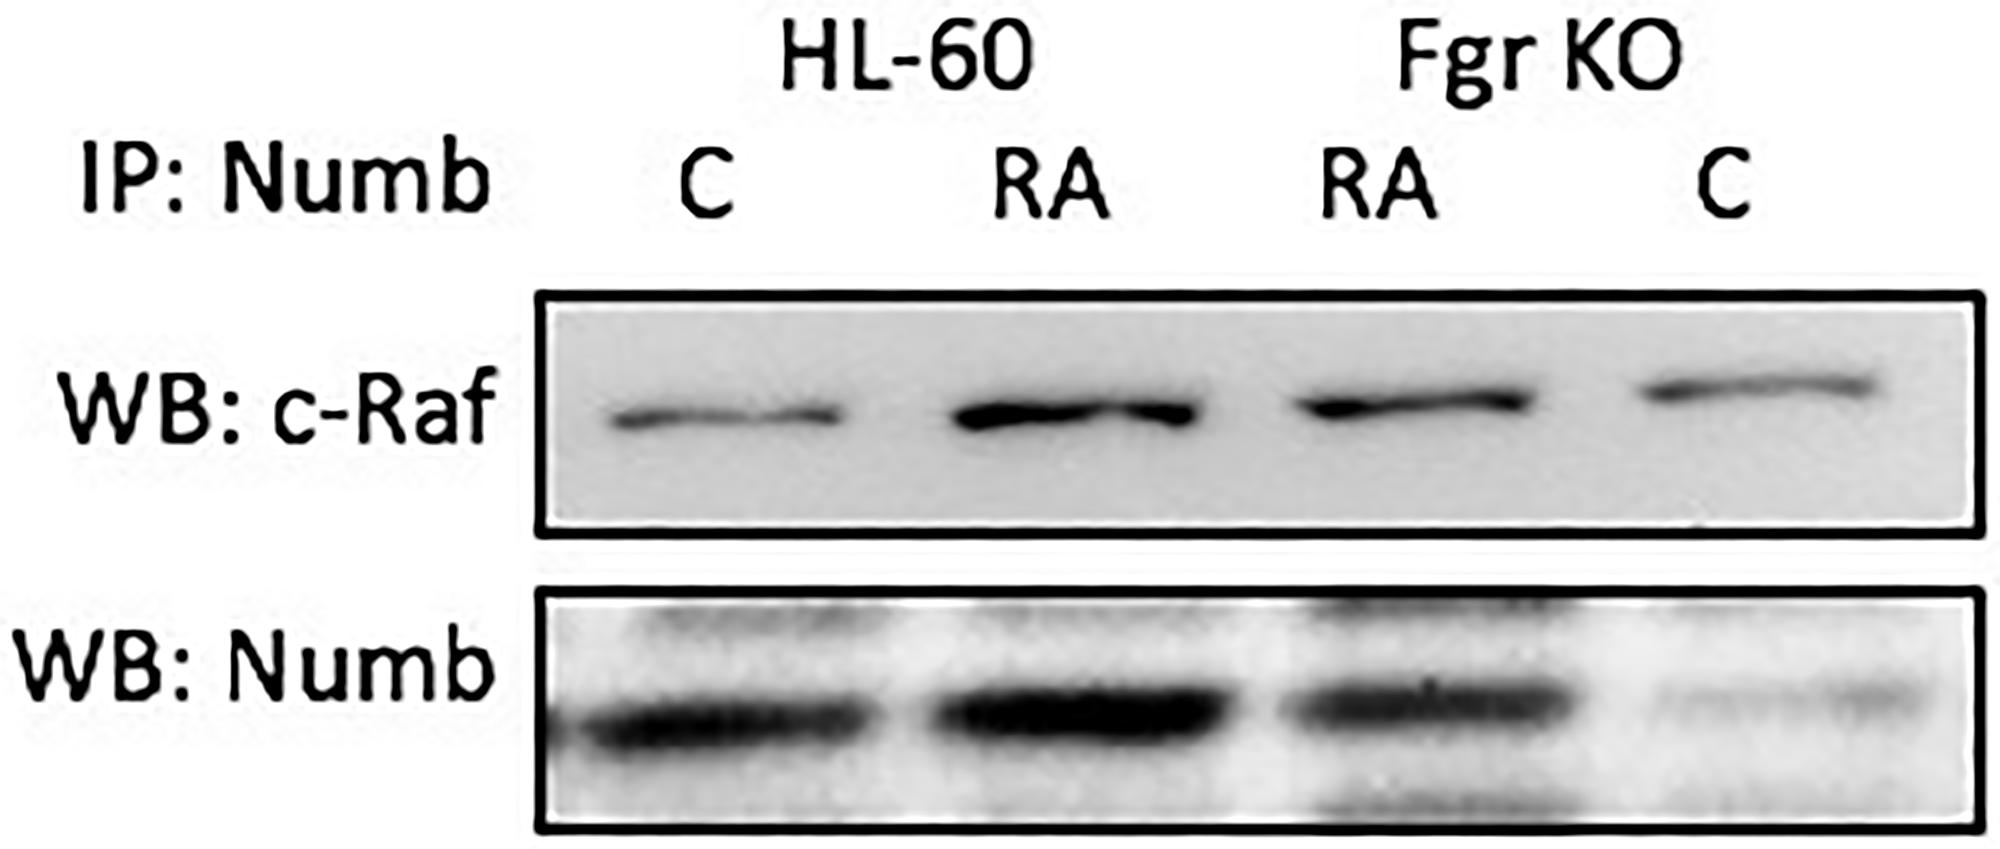 Numb binding Raf in HL-60 wt and Fgr KO cells assayed by immunoprecipitation.